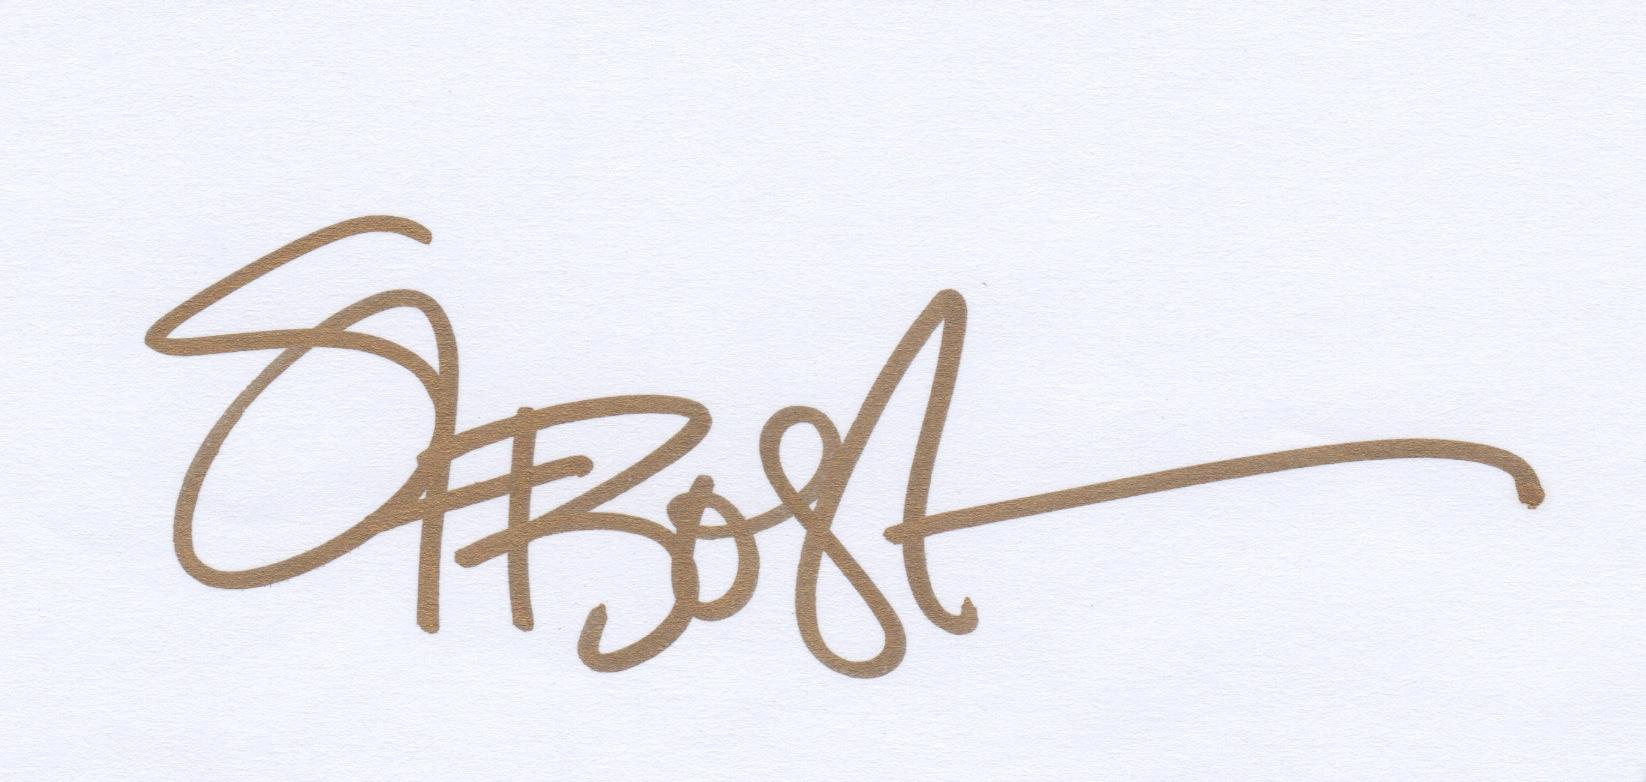 Stephanie Bostock ART's Signature